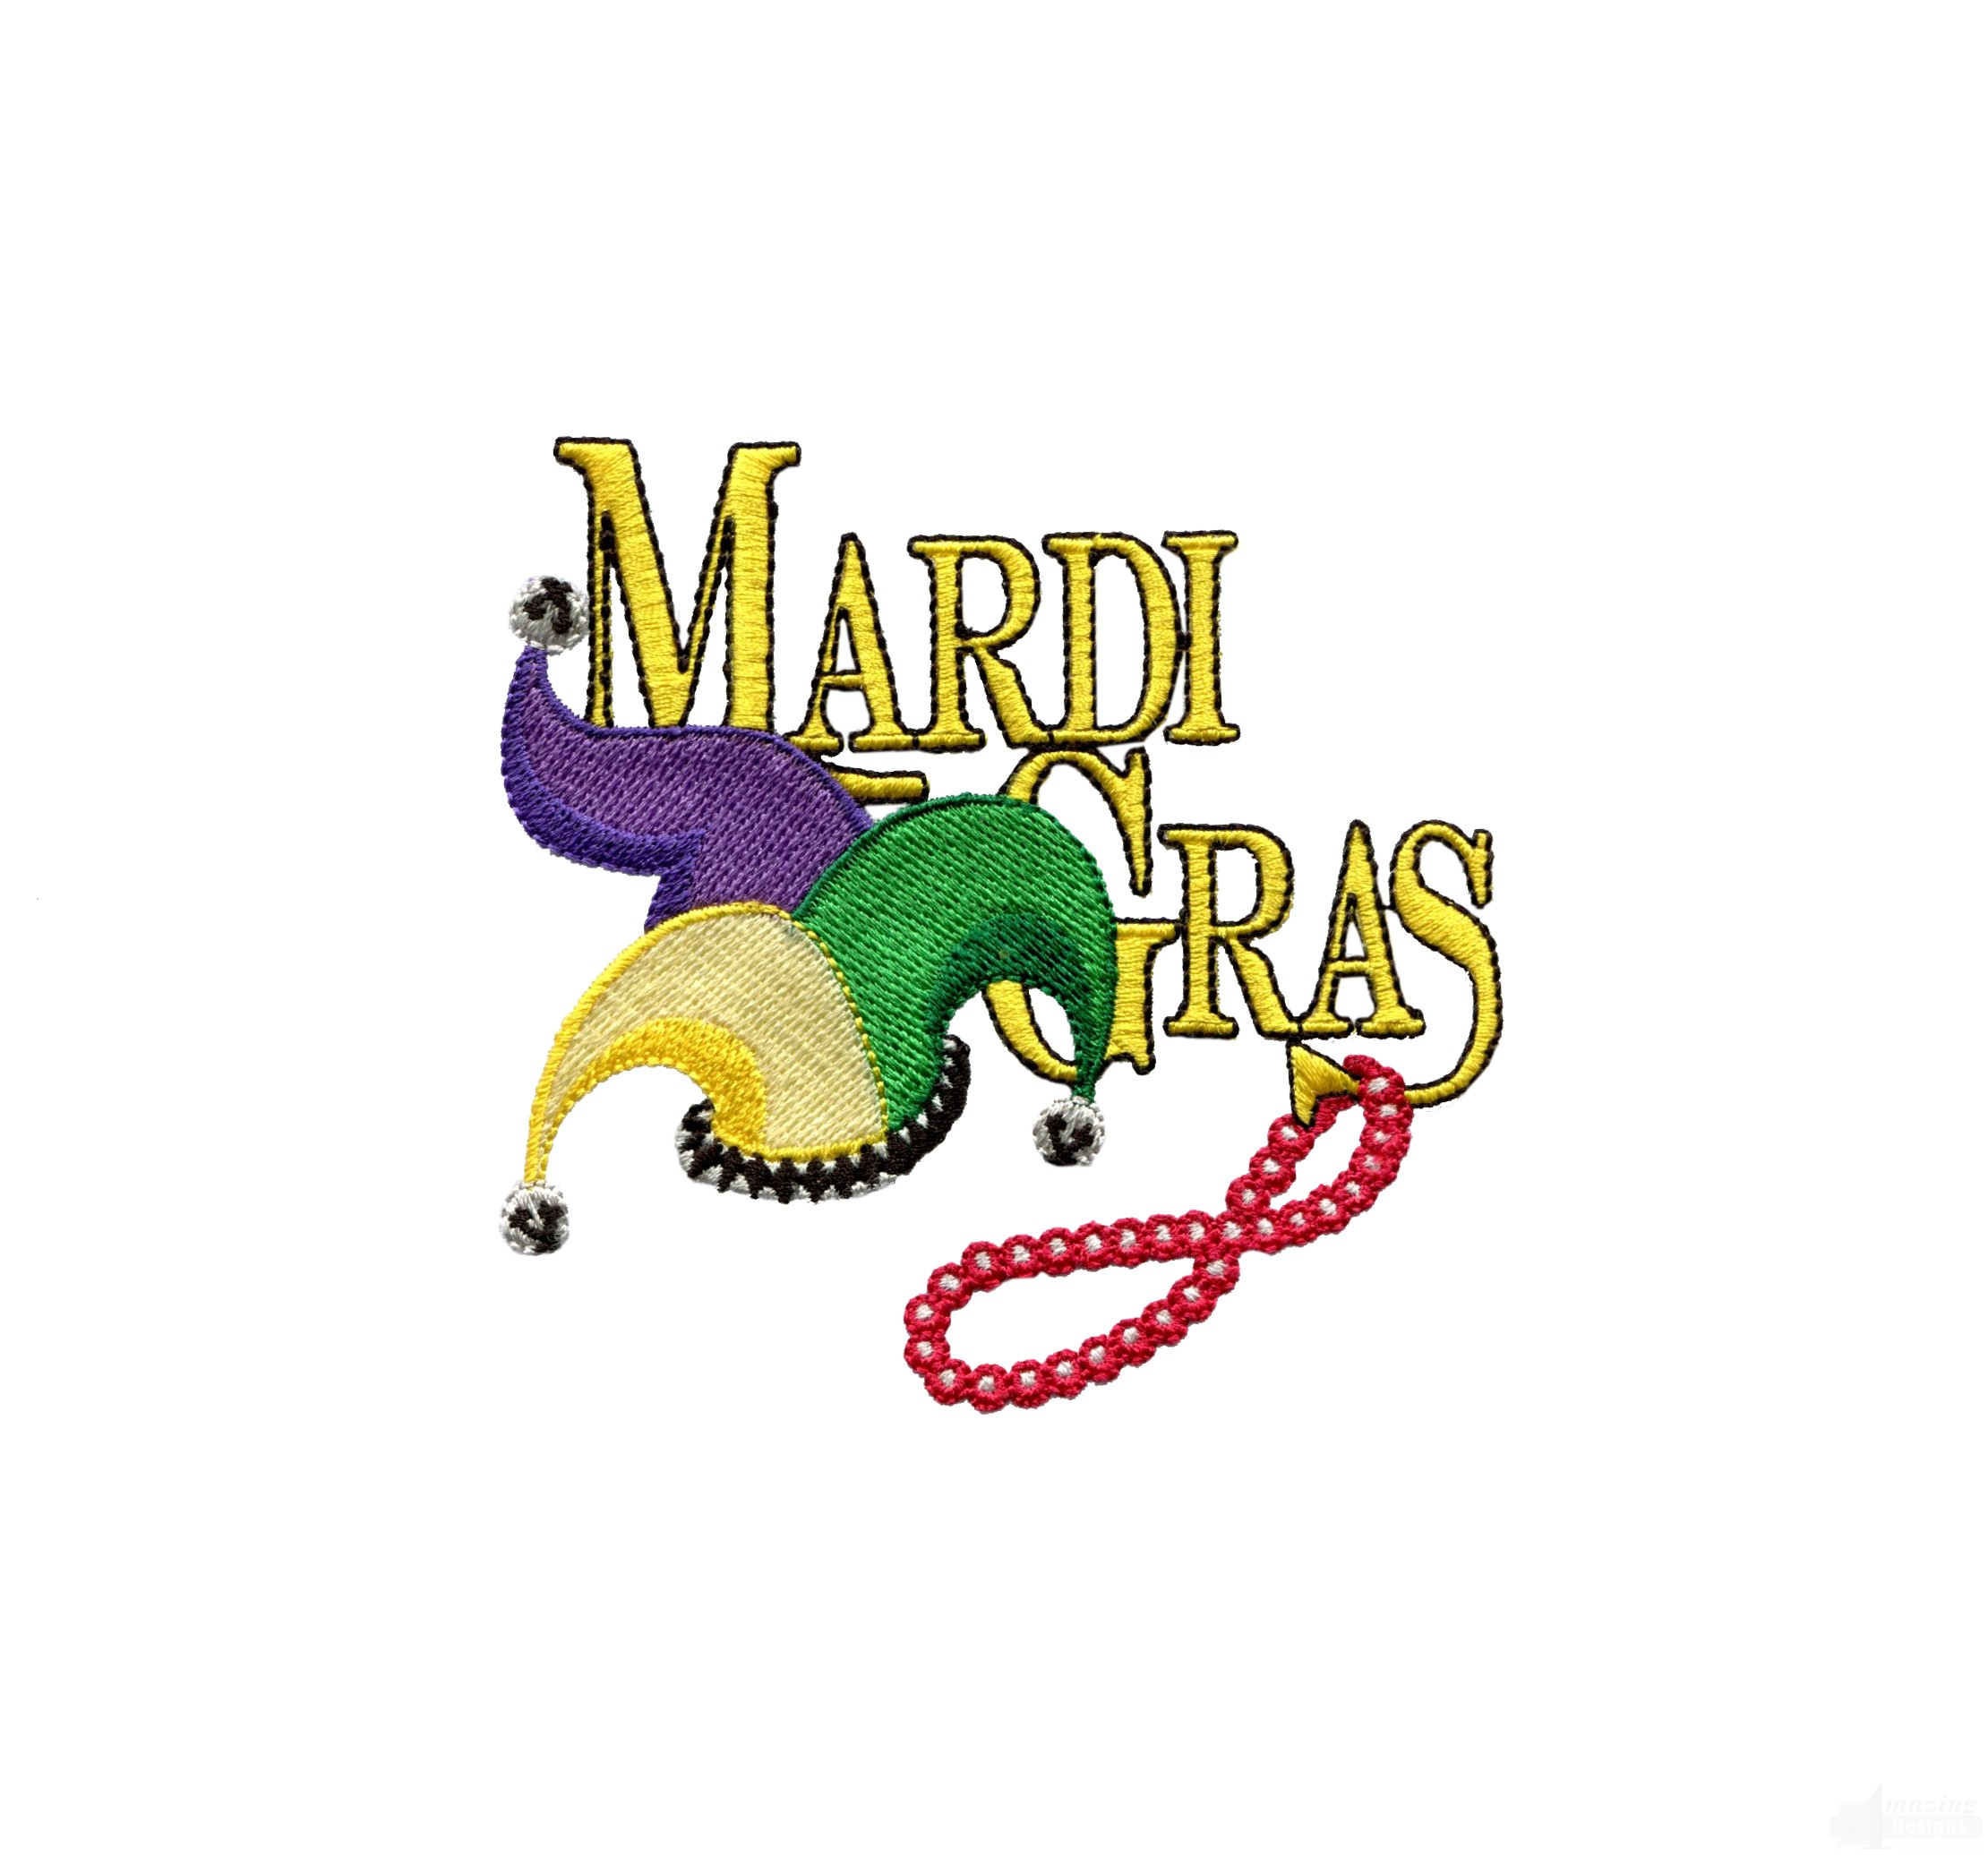 Mardi Gras Beads Border Mardi gras hat and beads